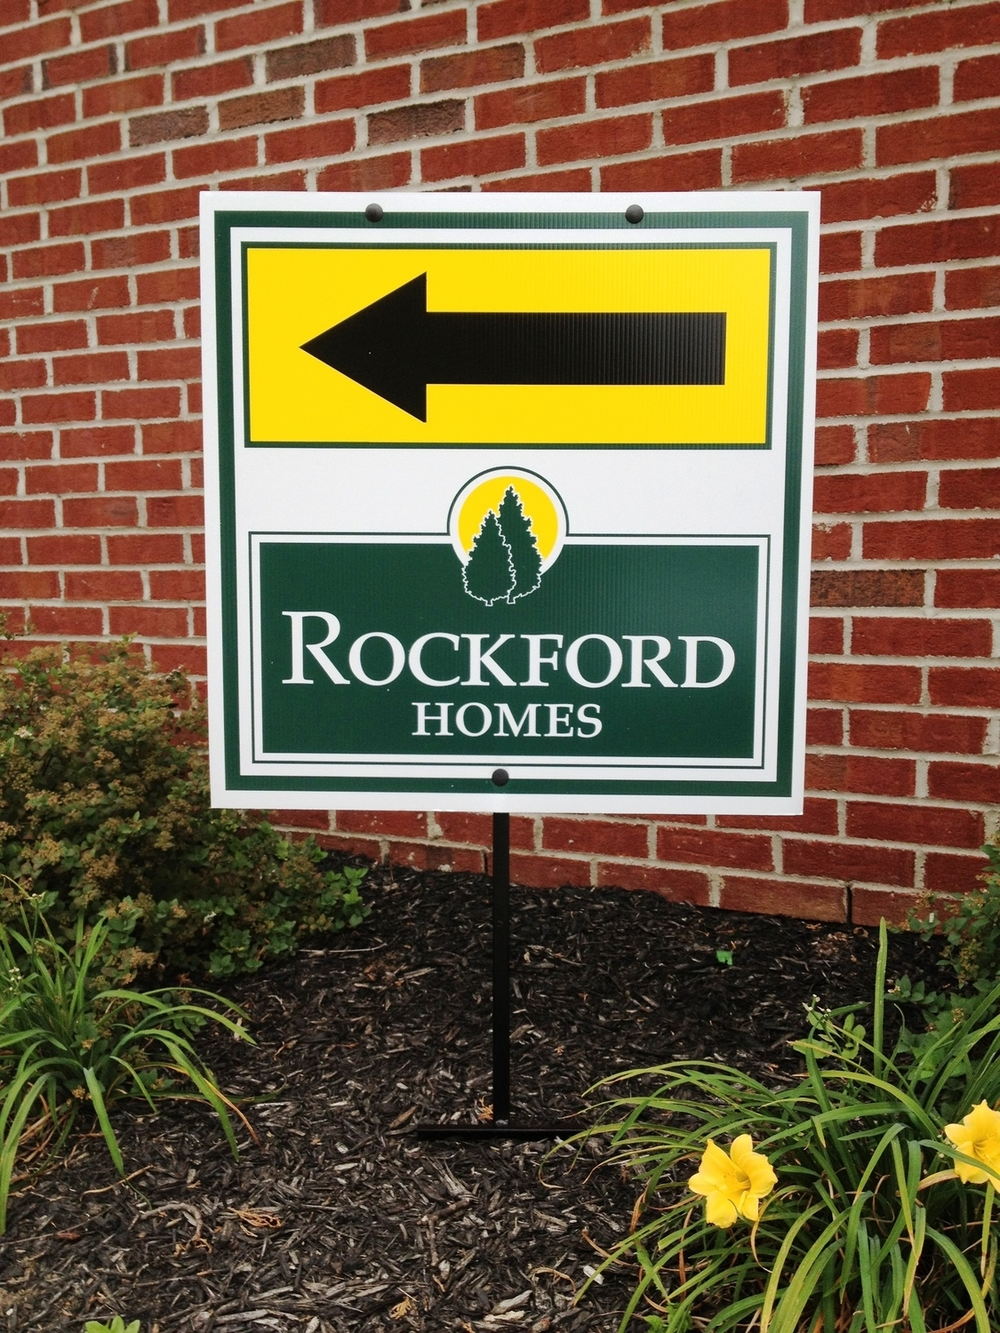 2012.09.21 Rockford Directional A.JPG